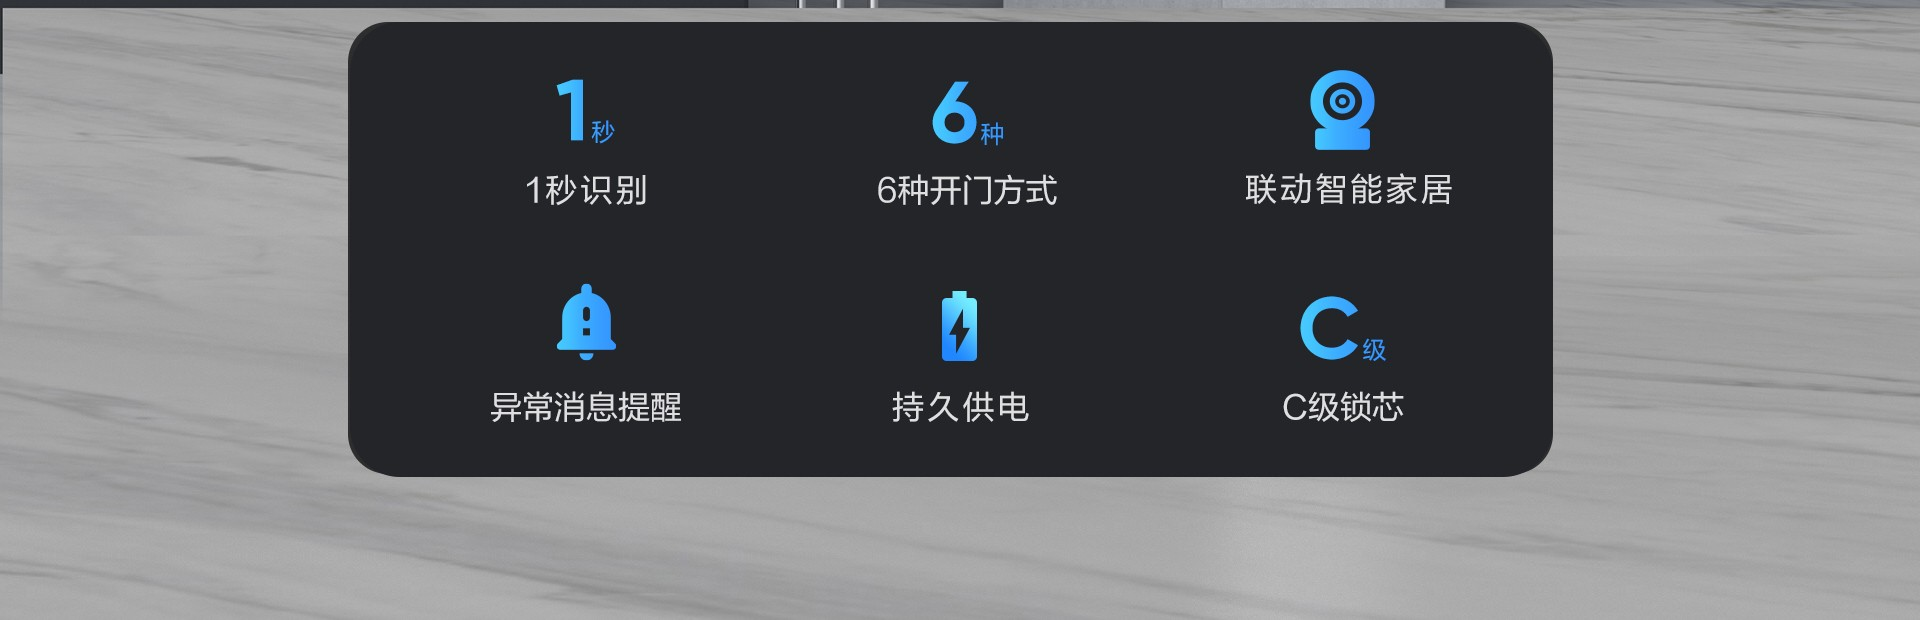 15S-web_02.jpg